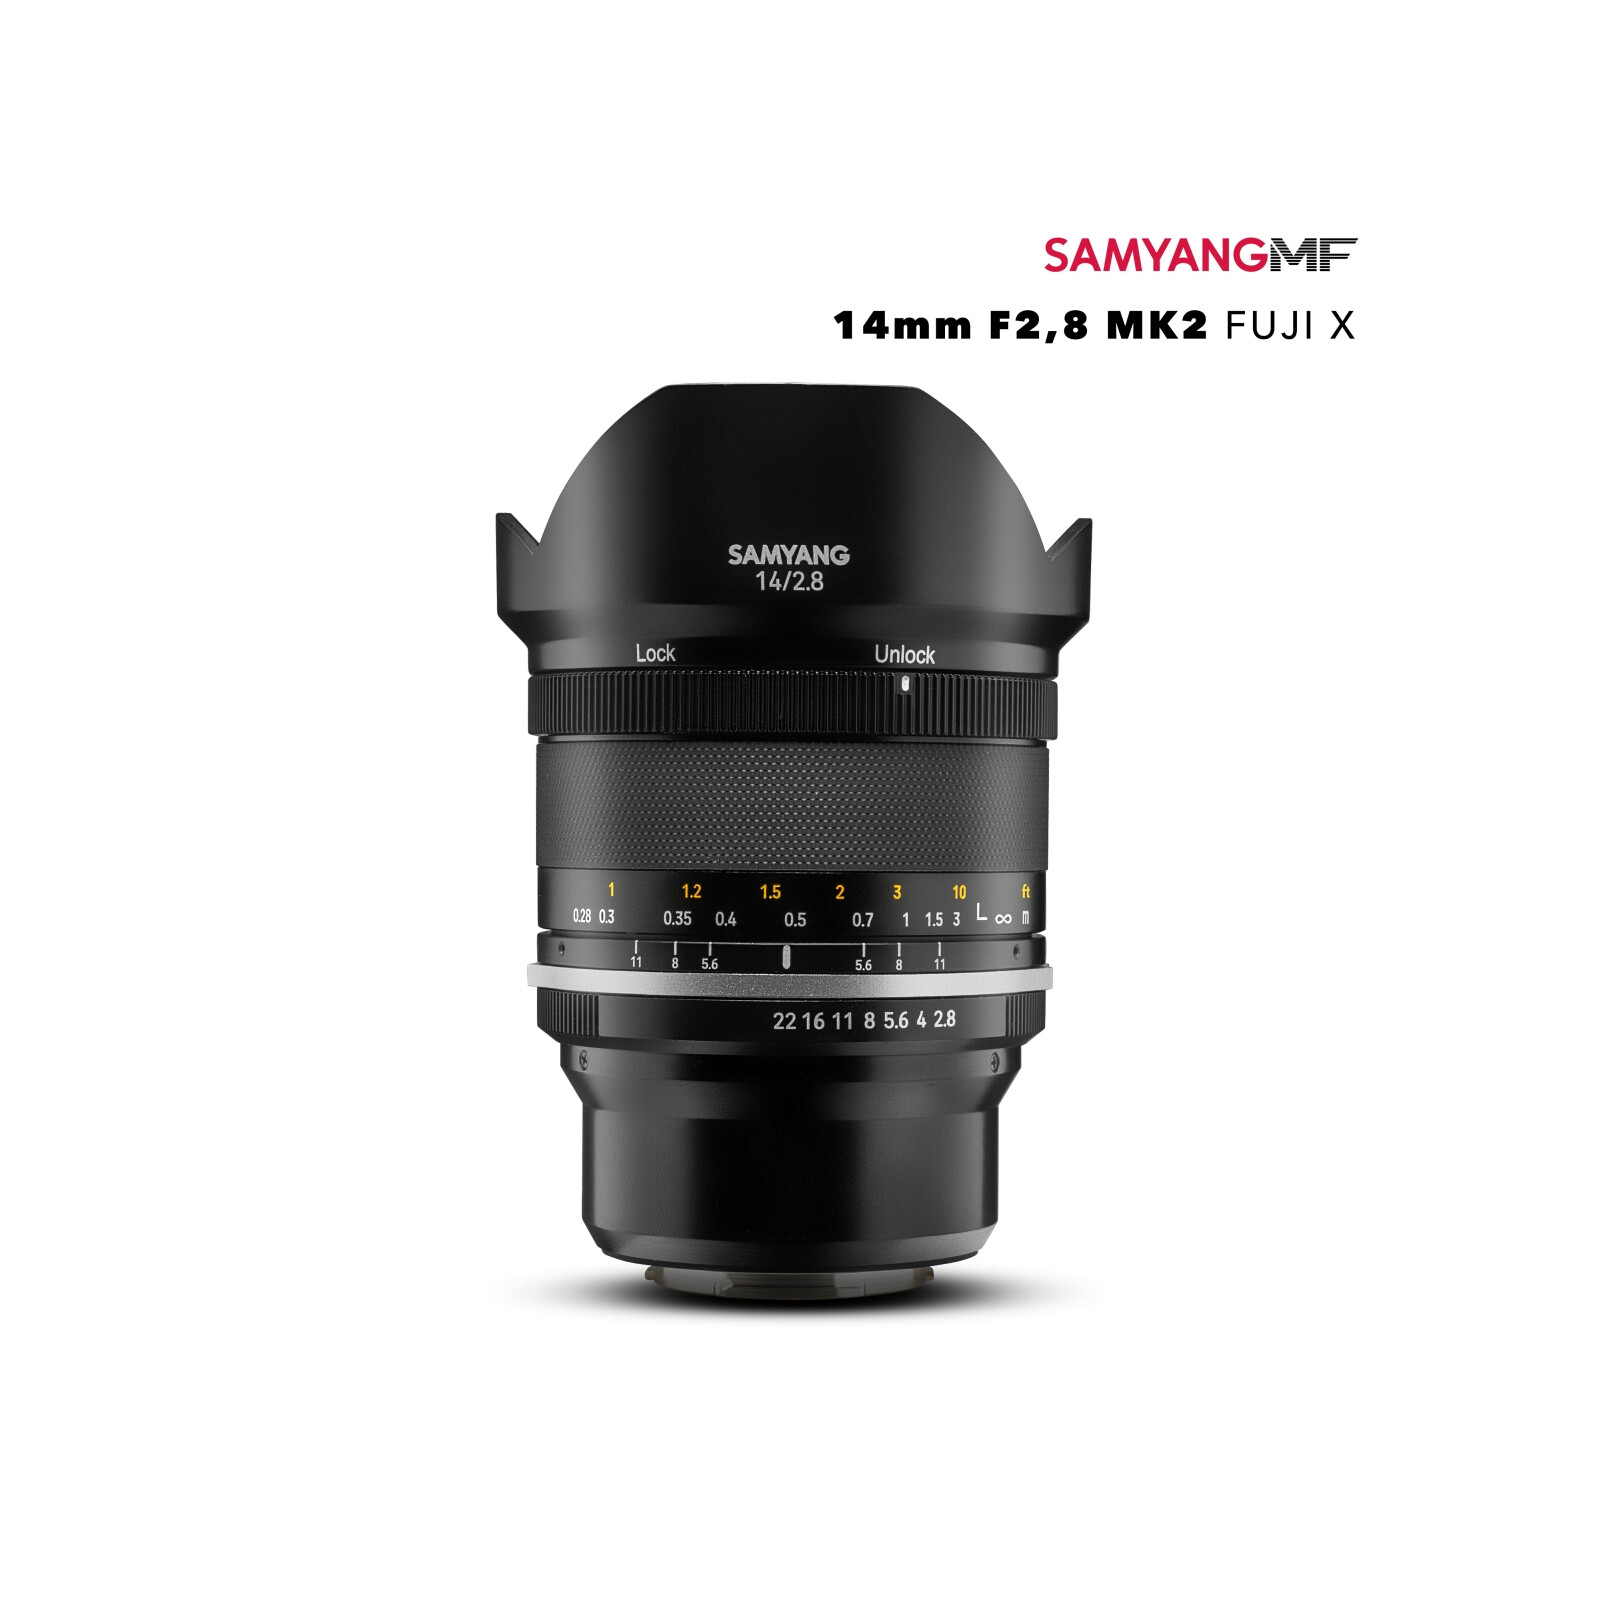 Samyang MF 14/2,8 MK2 Fuji X